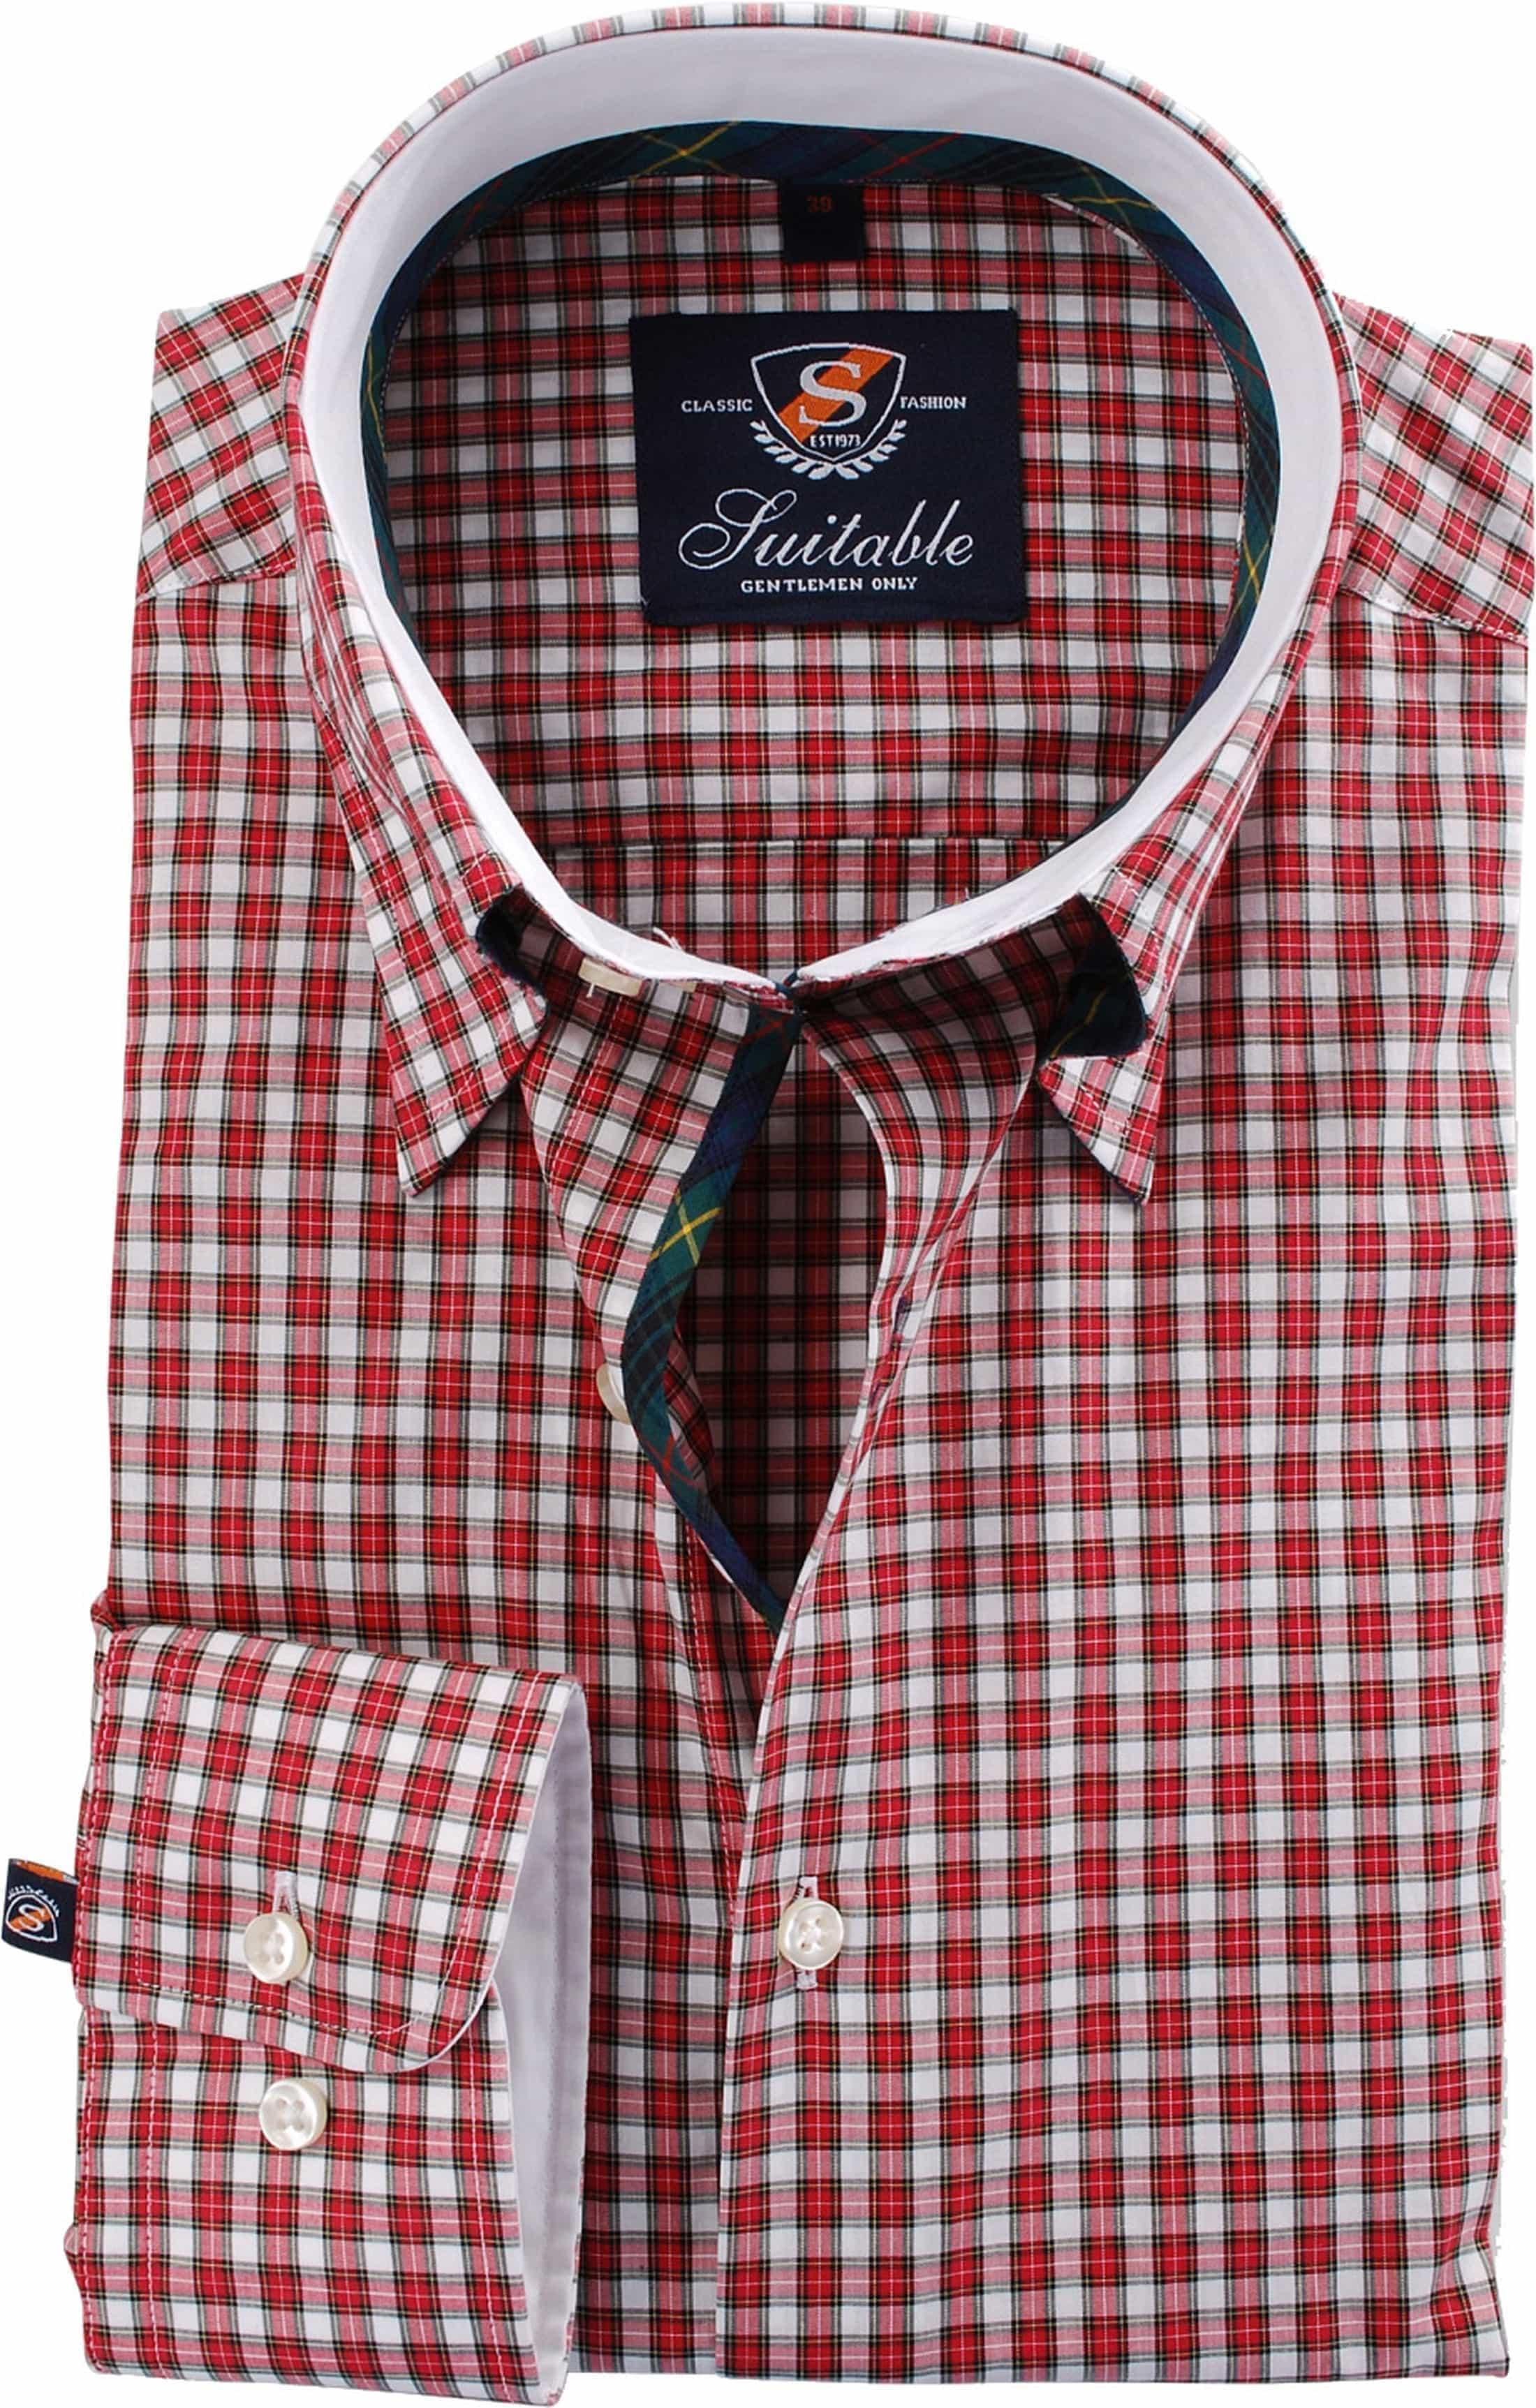 Overhemd Hoge Boord Heren.Shirt Hoge Boord English Red Check 44 14 100 Cot Poplin Online